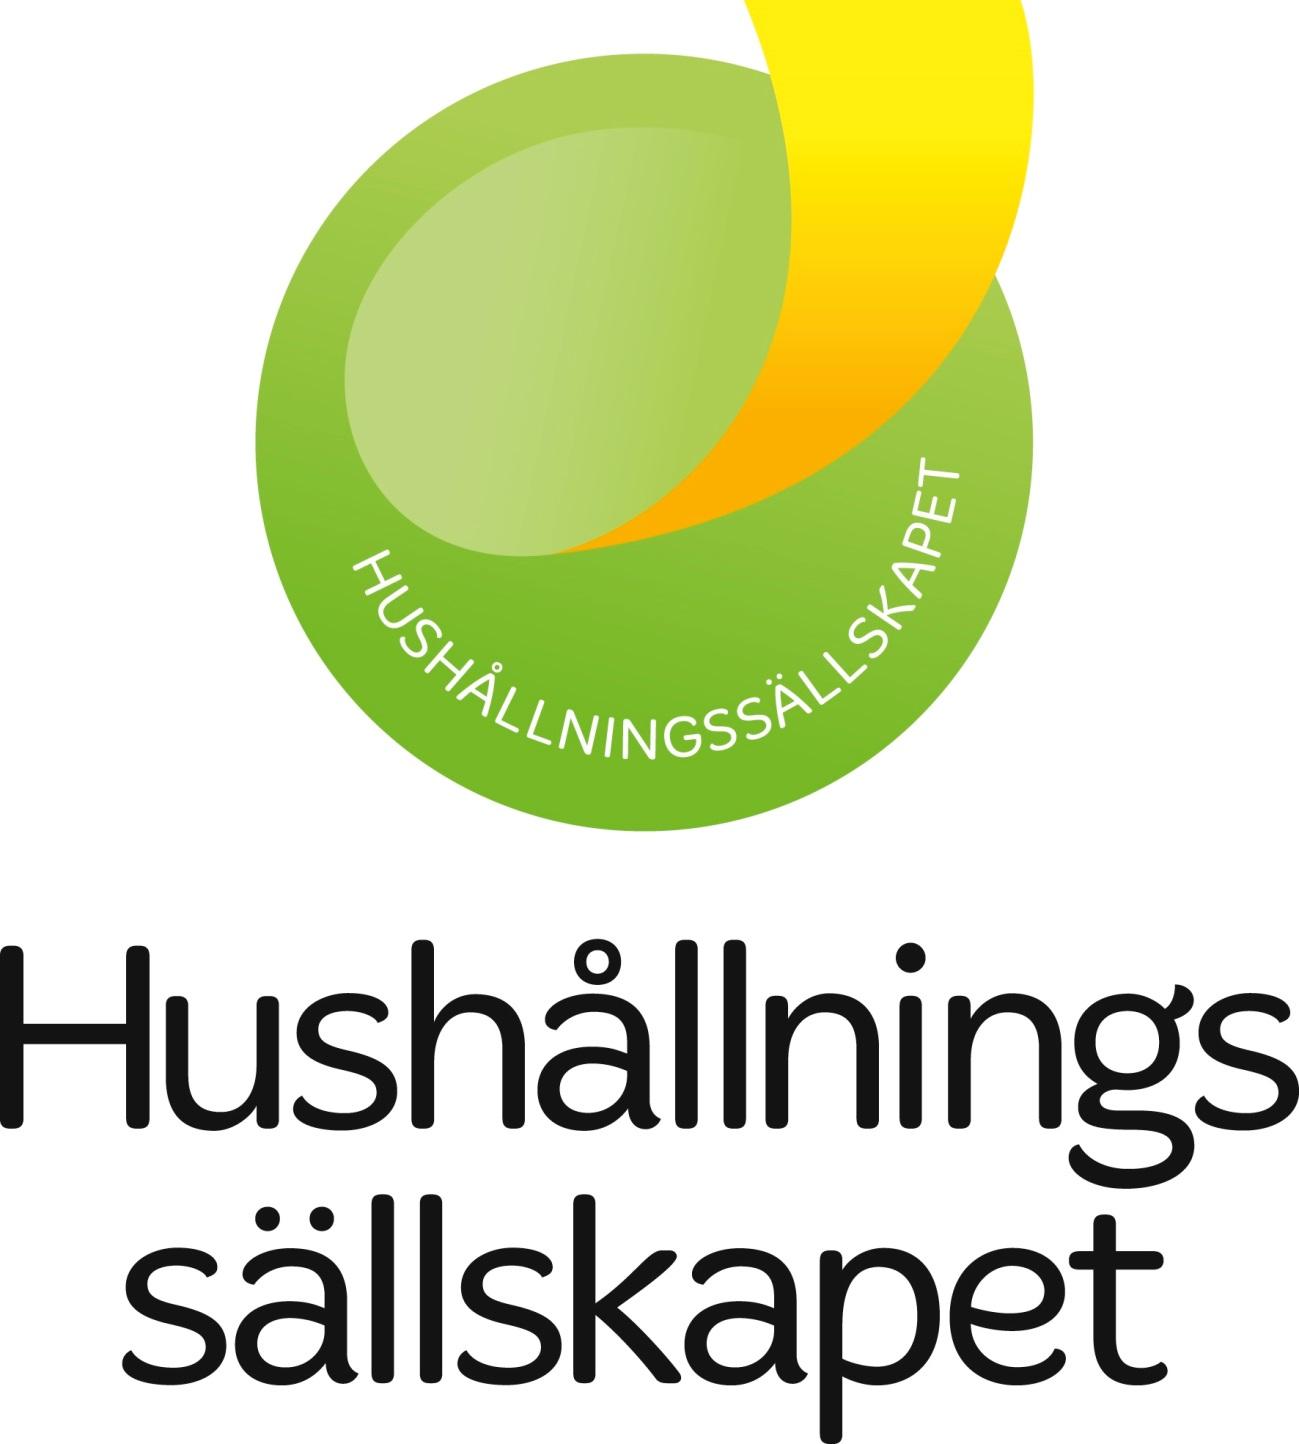 https://www.pomologisktcentrum.se/wp-content/uploads/2020/04/Logga-HSLuleå-1.jpg